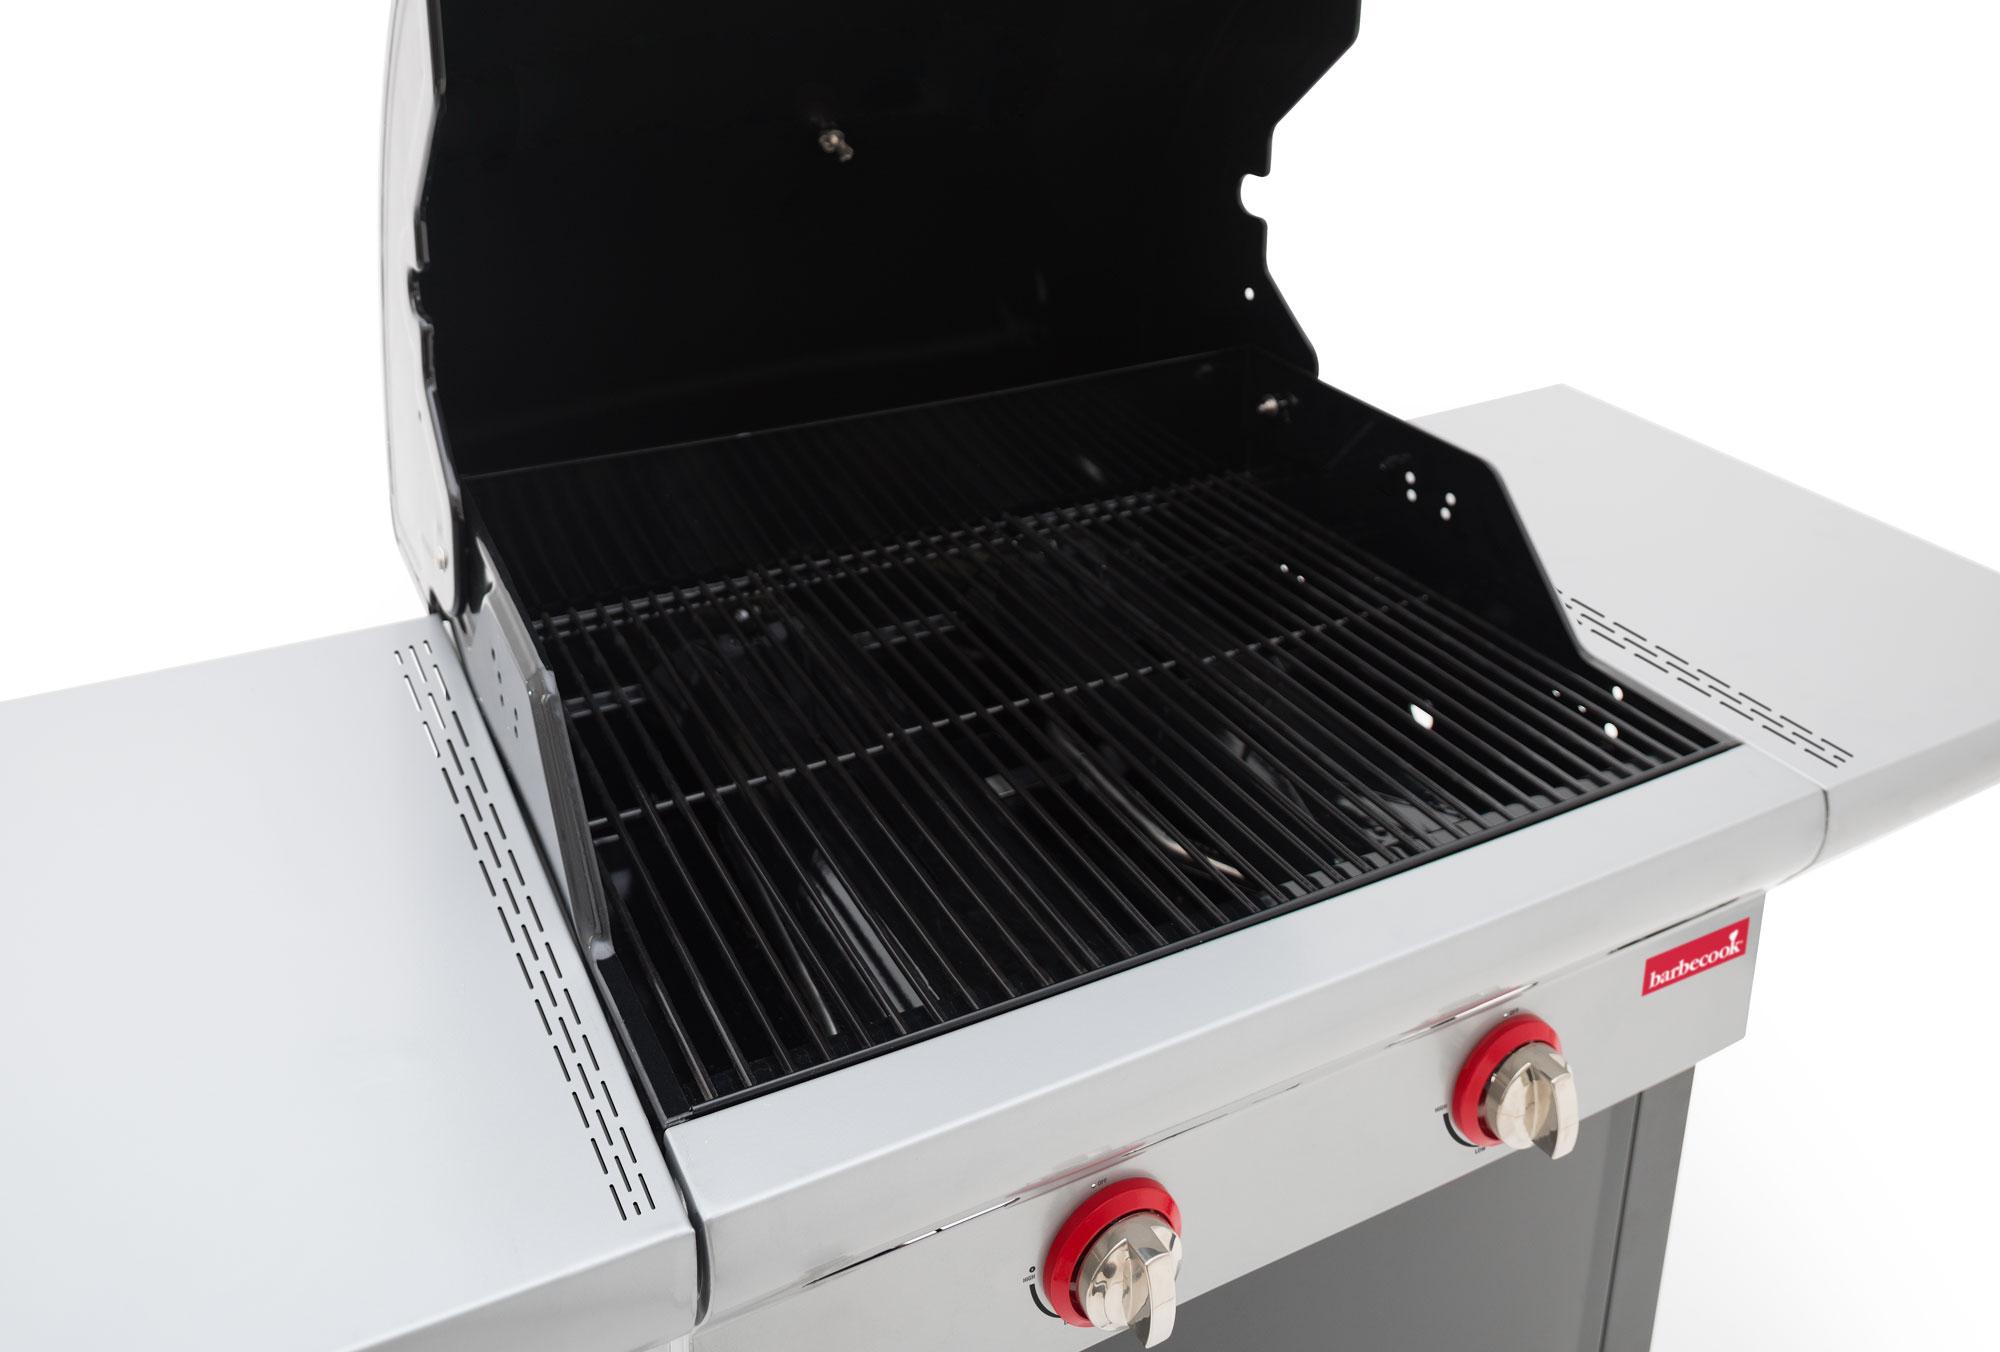 Billig Charbroil Gasgrill : Gasgrill gasgrillwagen barbecook spring grillfläche cm